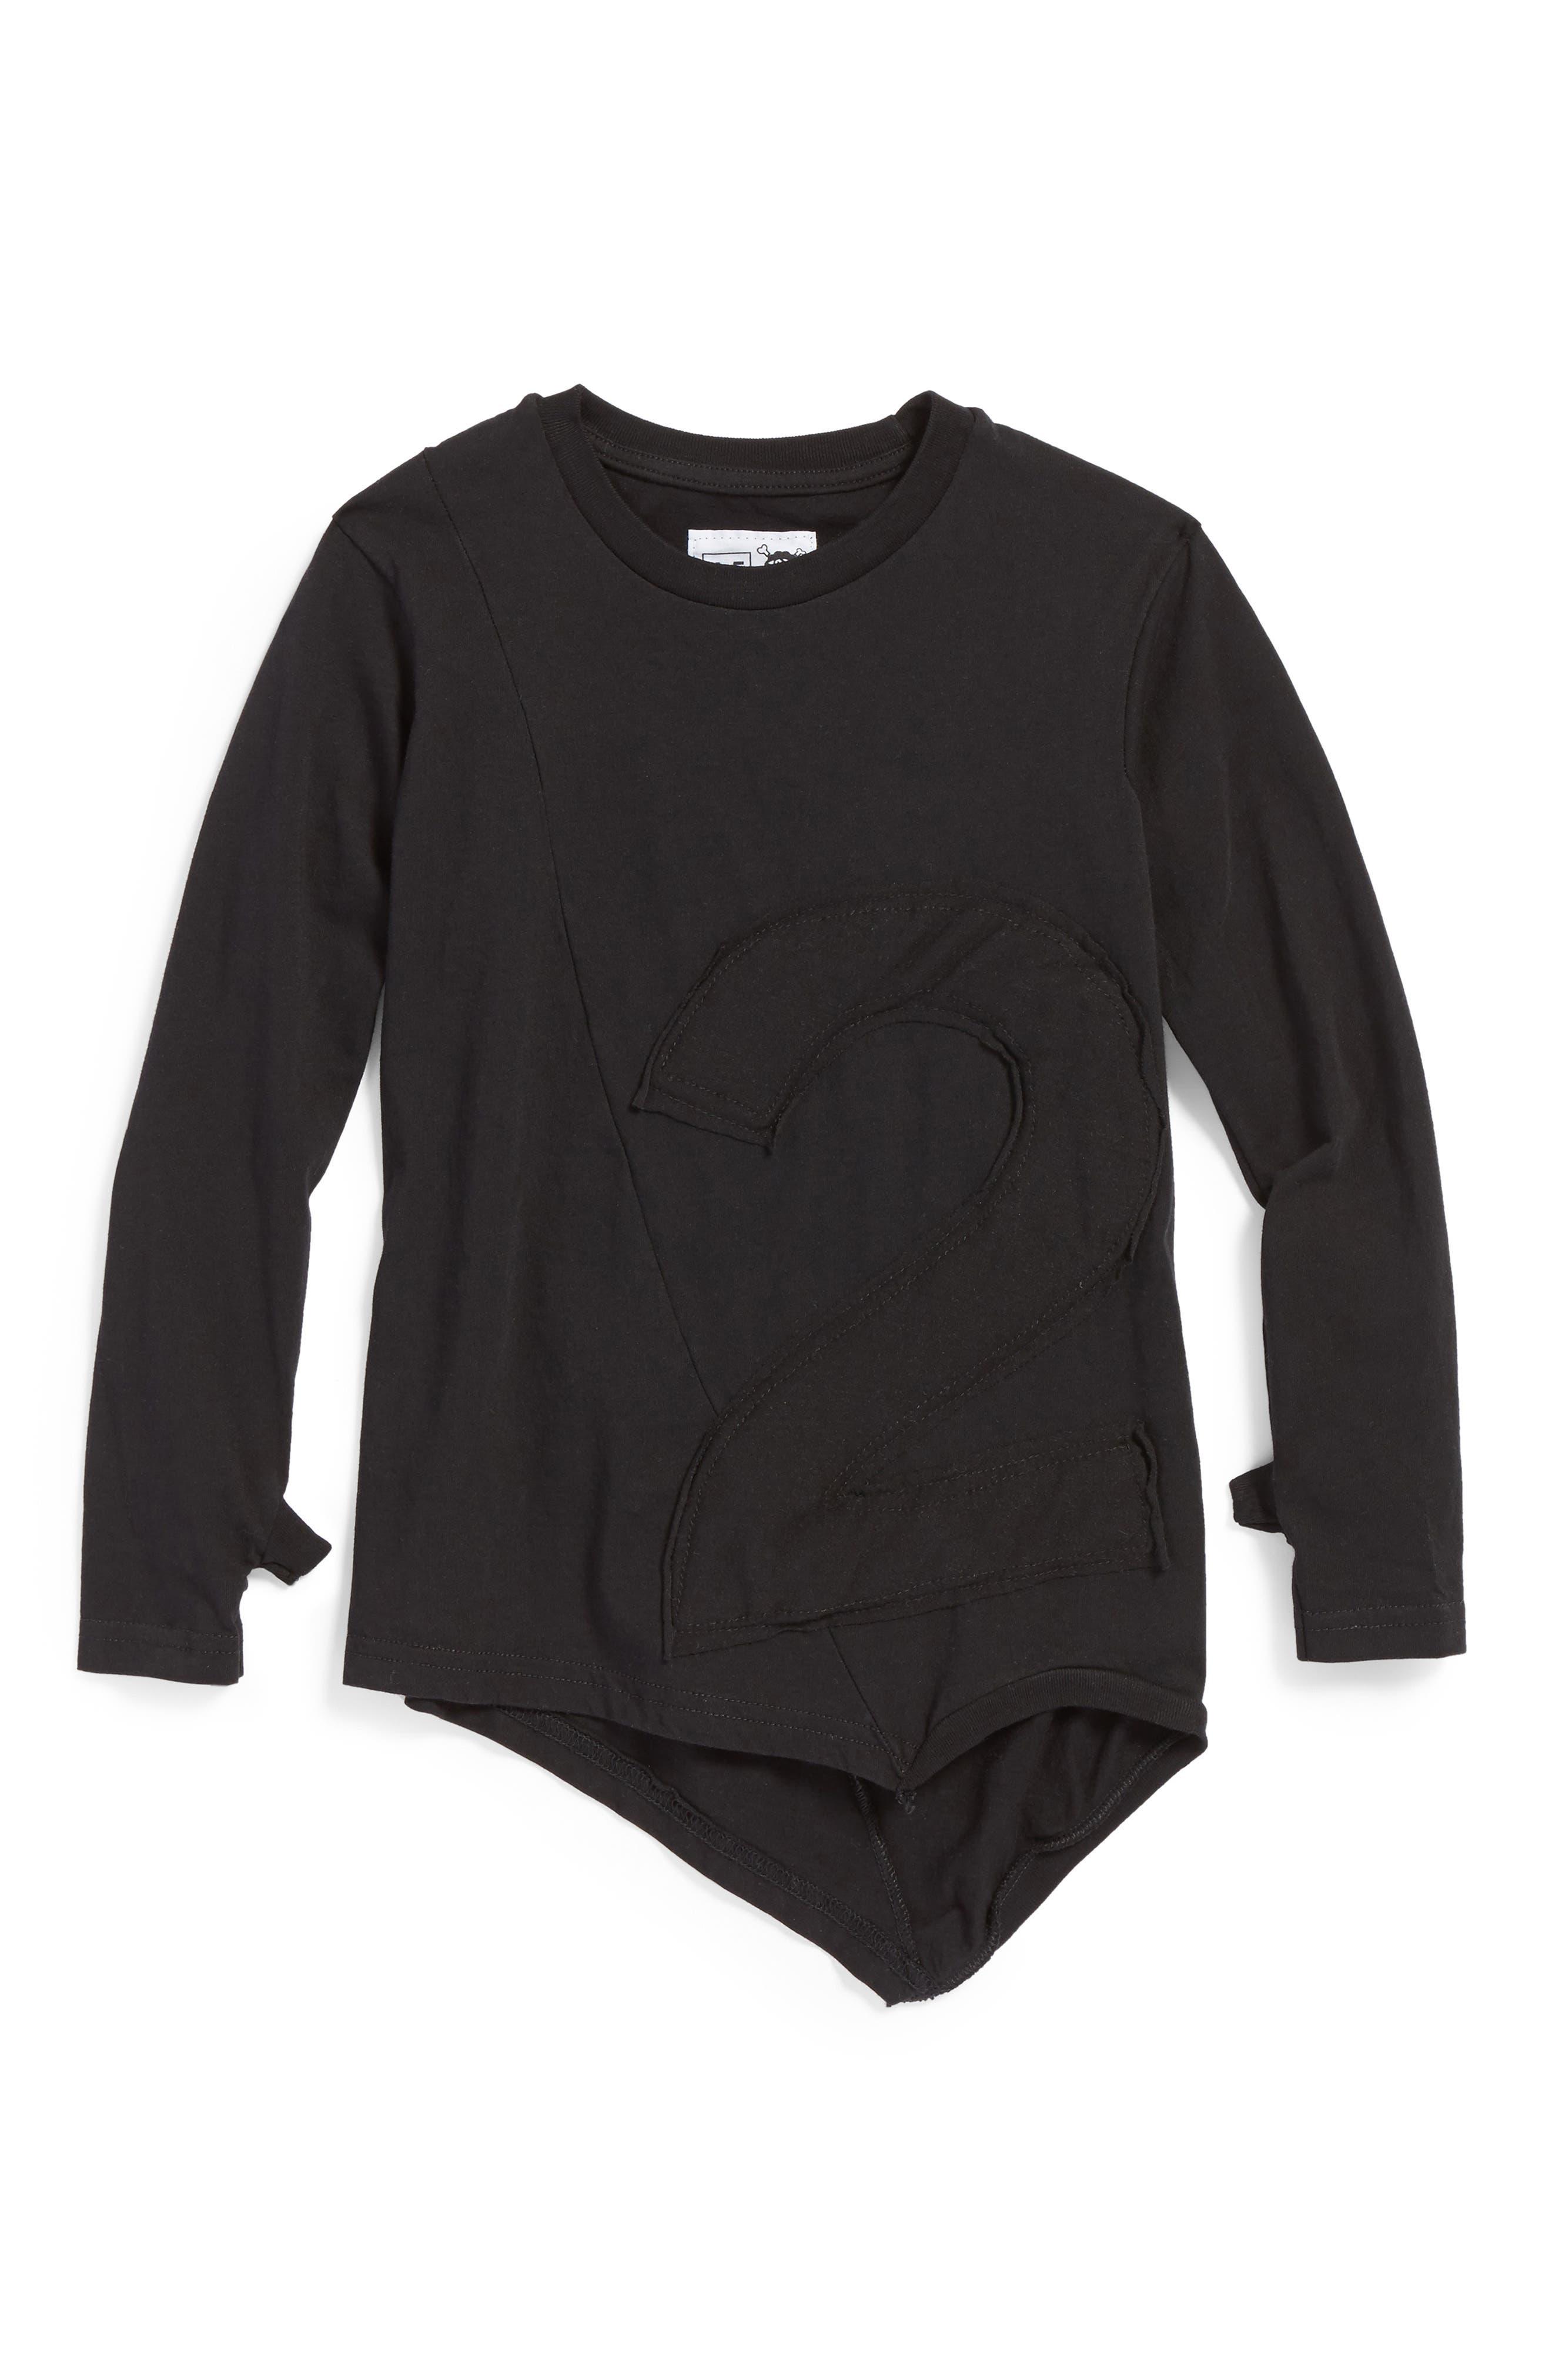 Main Image - NUNUNU Puffy Number Penguin Shirt (Toddler Girls & Little Girls)